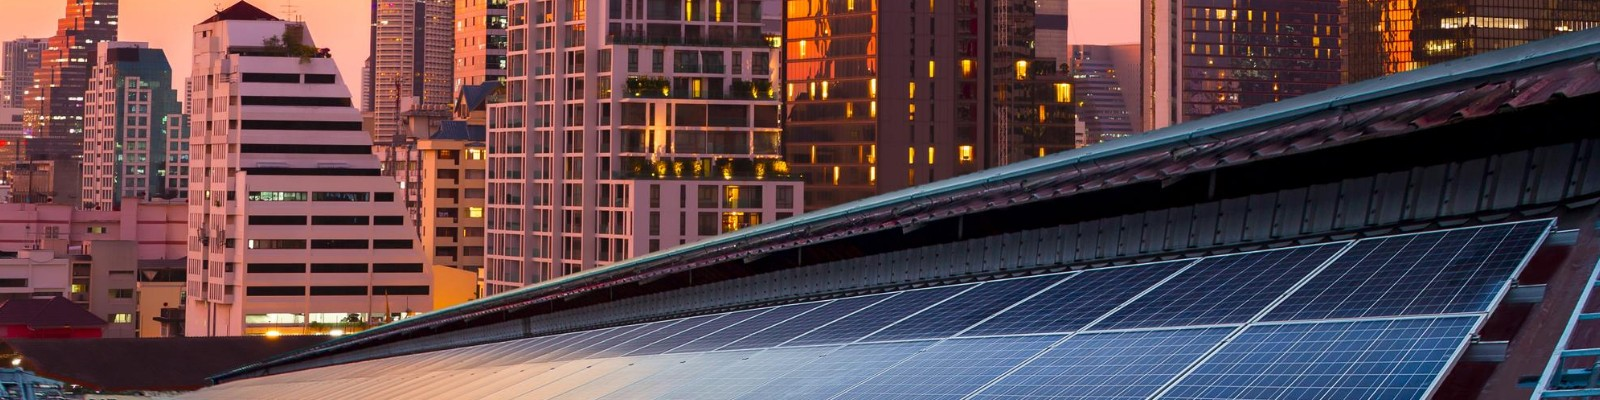 {:uk}Страхування сонячних електростанцій{:}{:ru}Страхование солнечных электростанций{:}